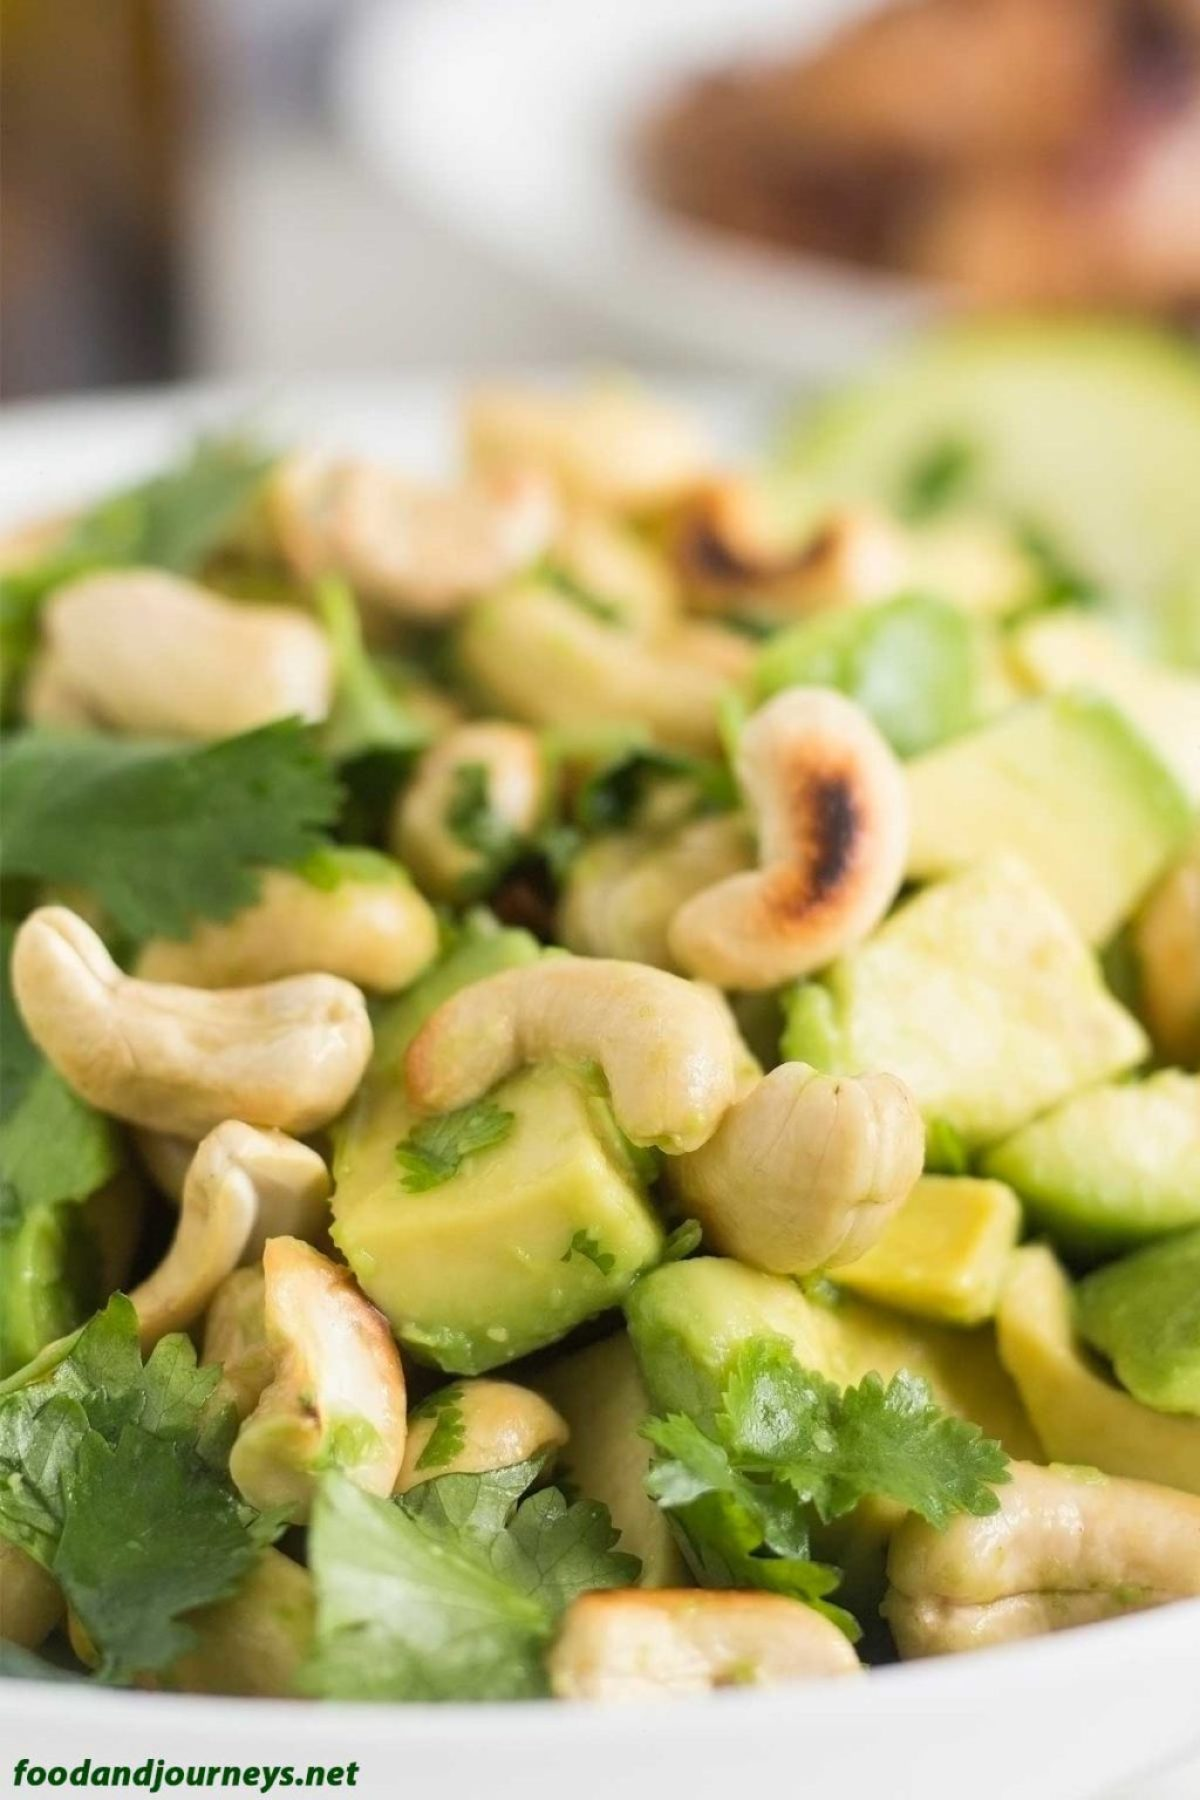 Green Summer Salad pic1|foodandjourneys.net